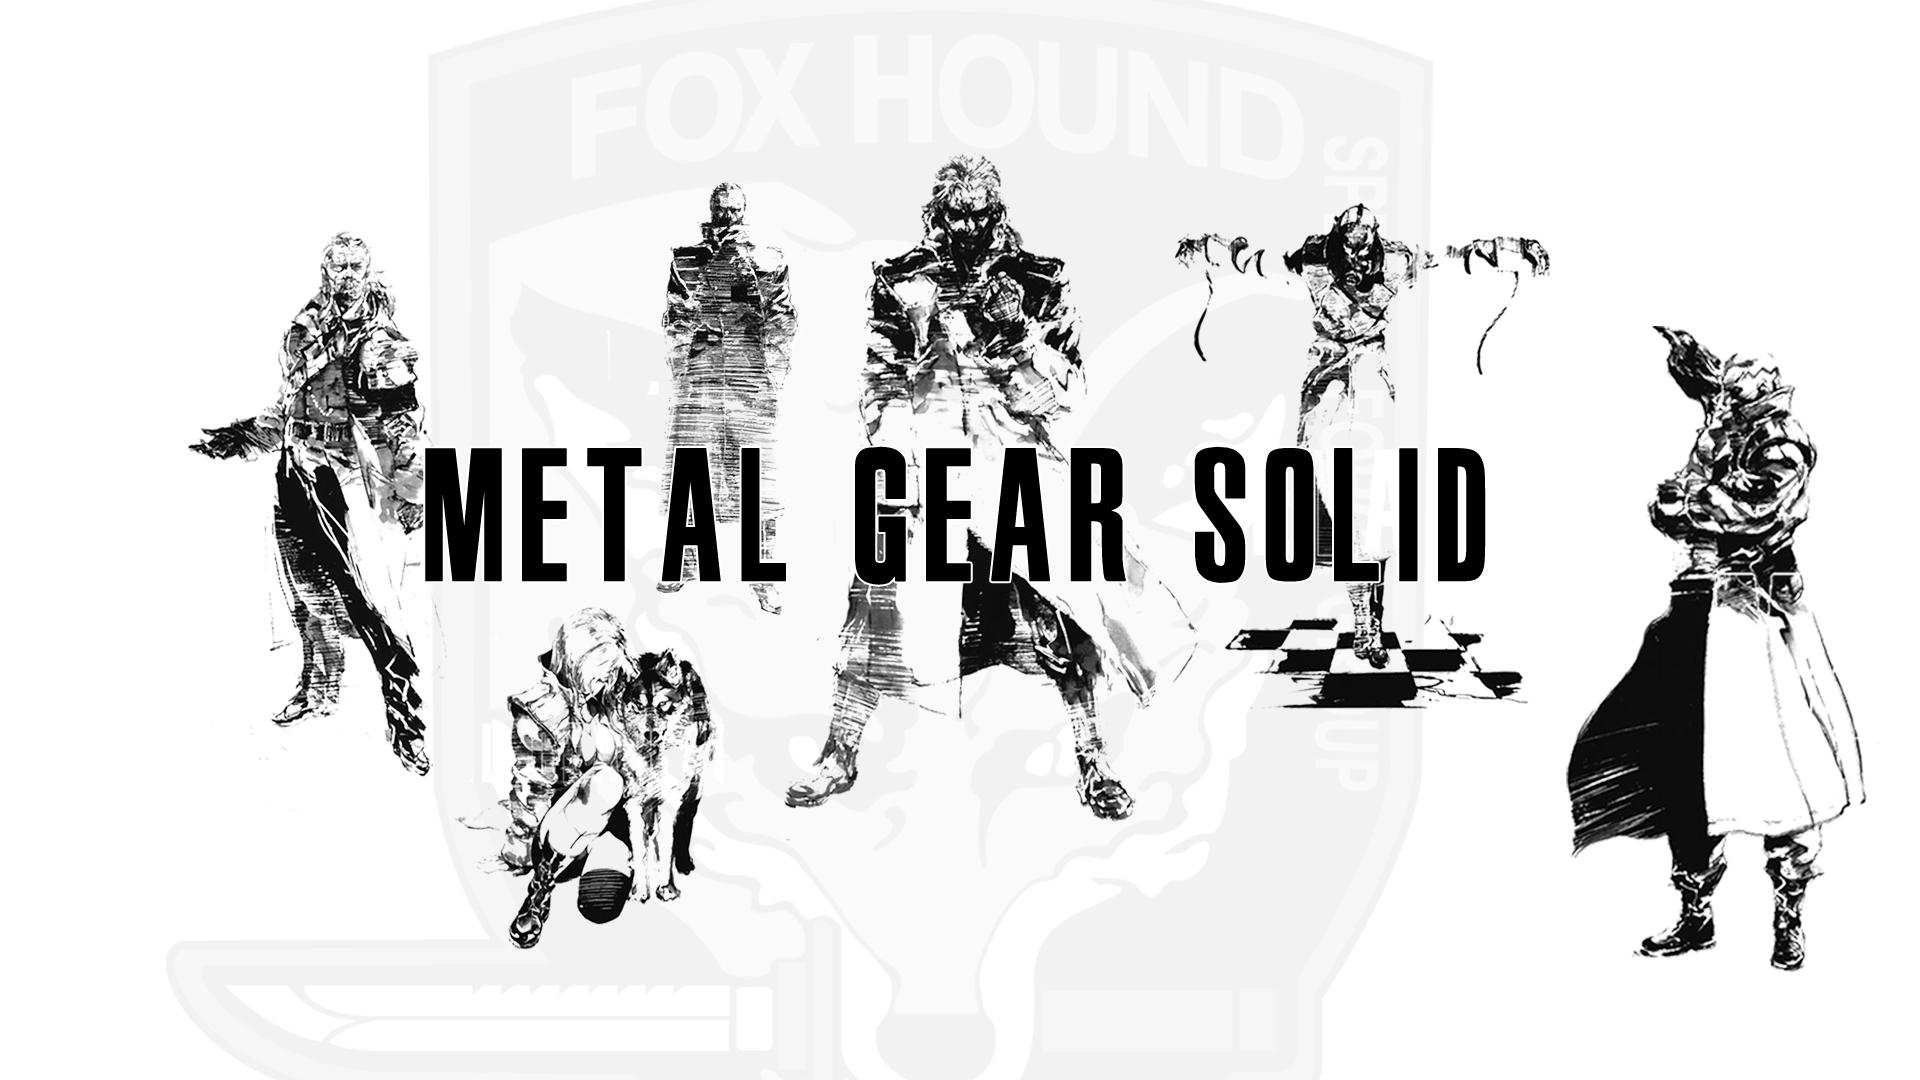 Foxhound metal gear solid wallpaper Wallpaper Wide HD 1920x1080